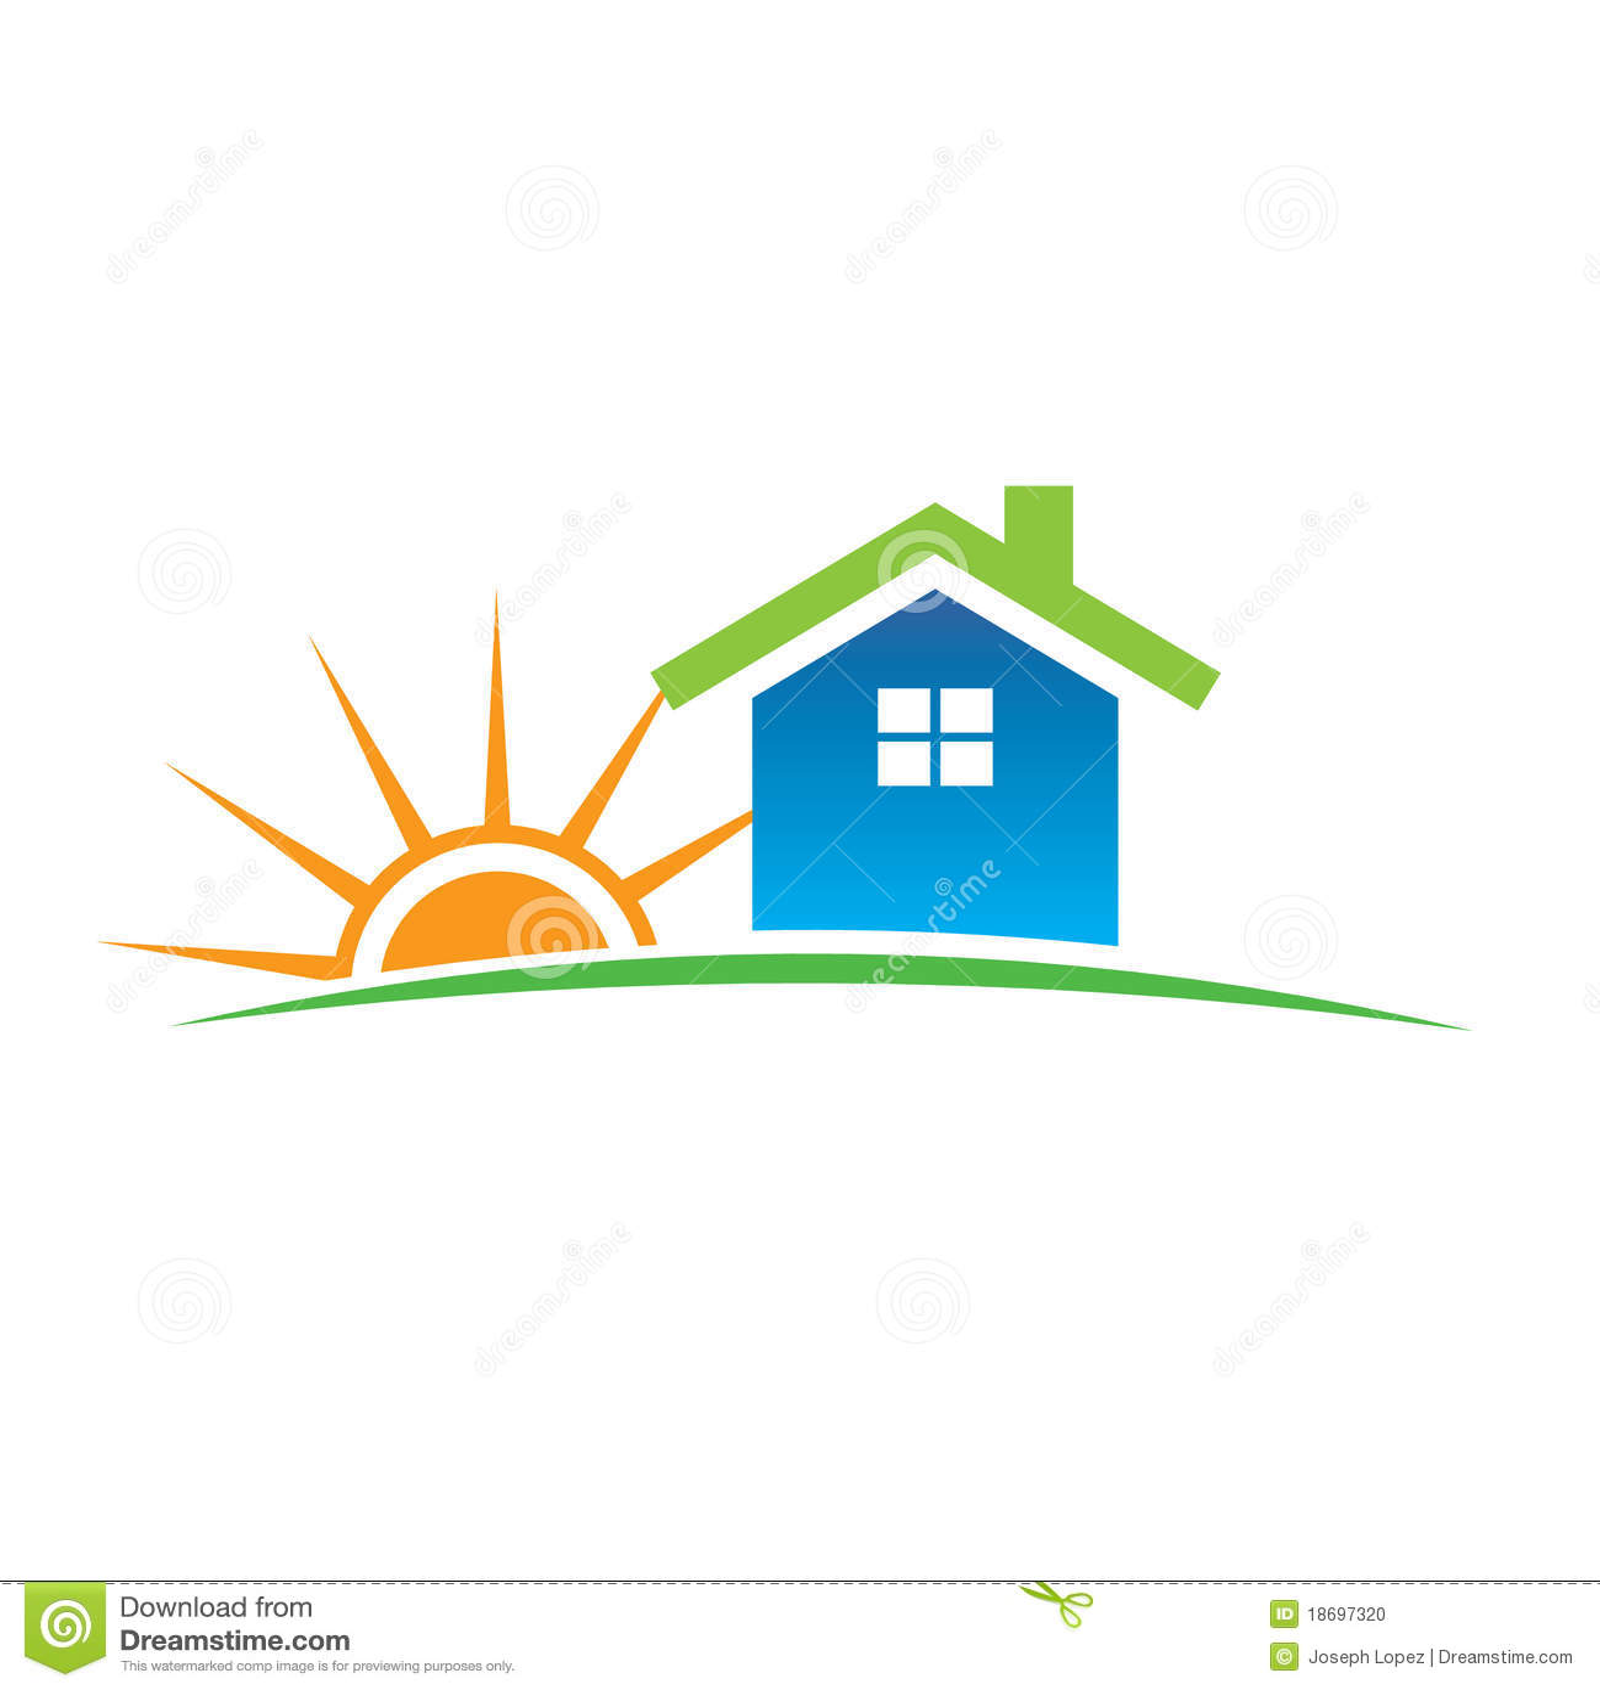 Home And Sunshine Logo Stock Photo - Image: 18697320